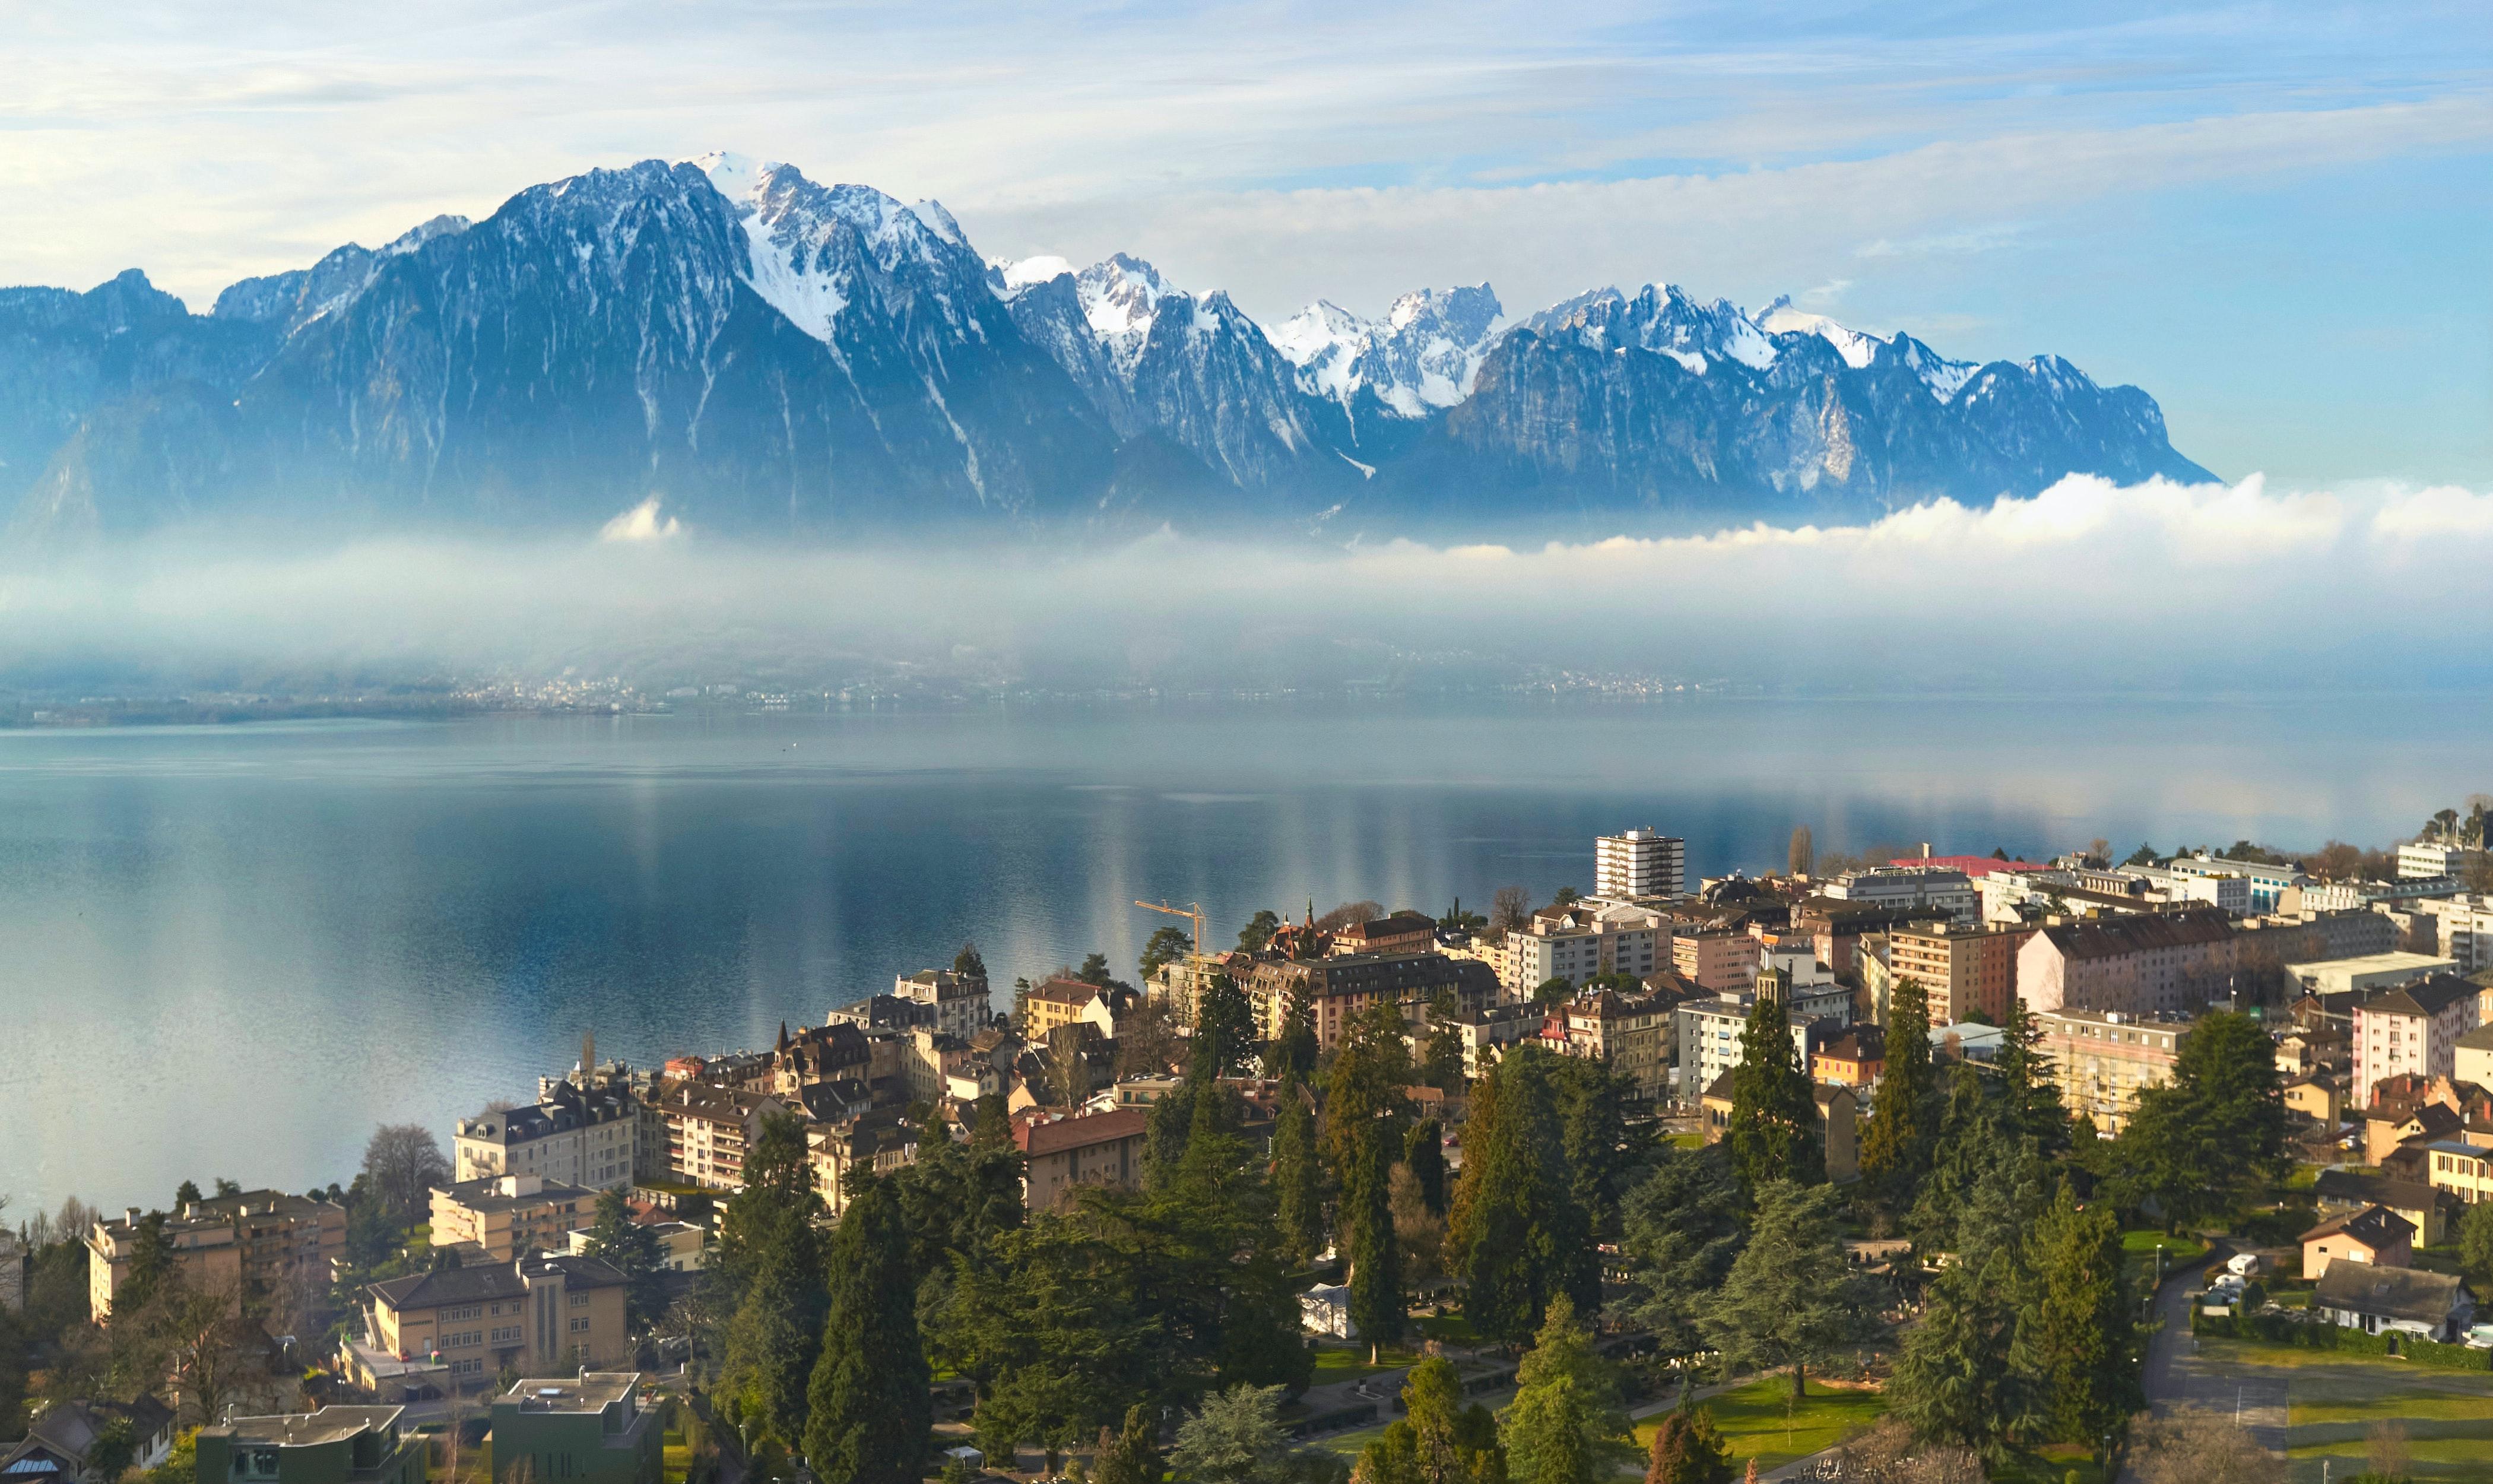 Montreux, 10 Best Honeymoon Places To Visit in Switzerland